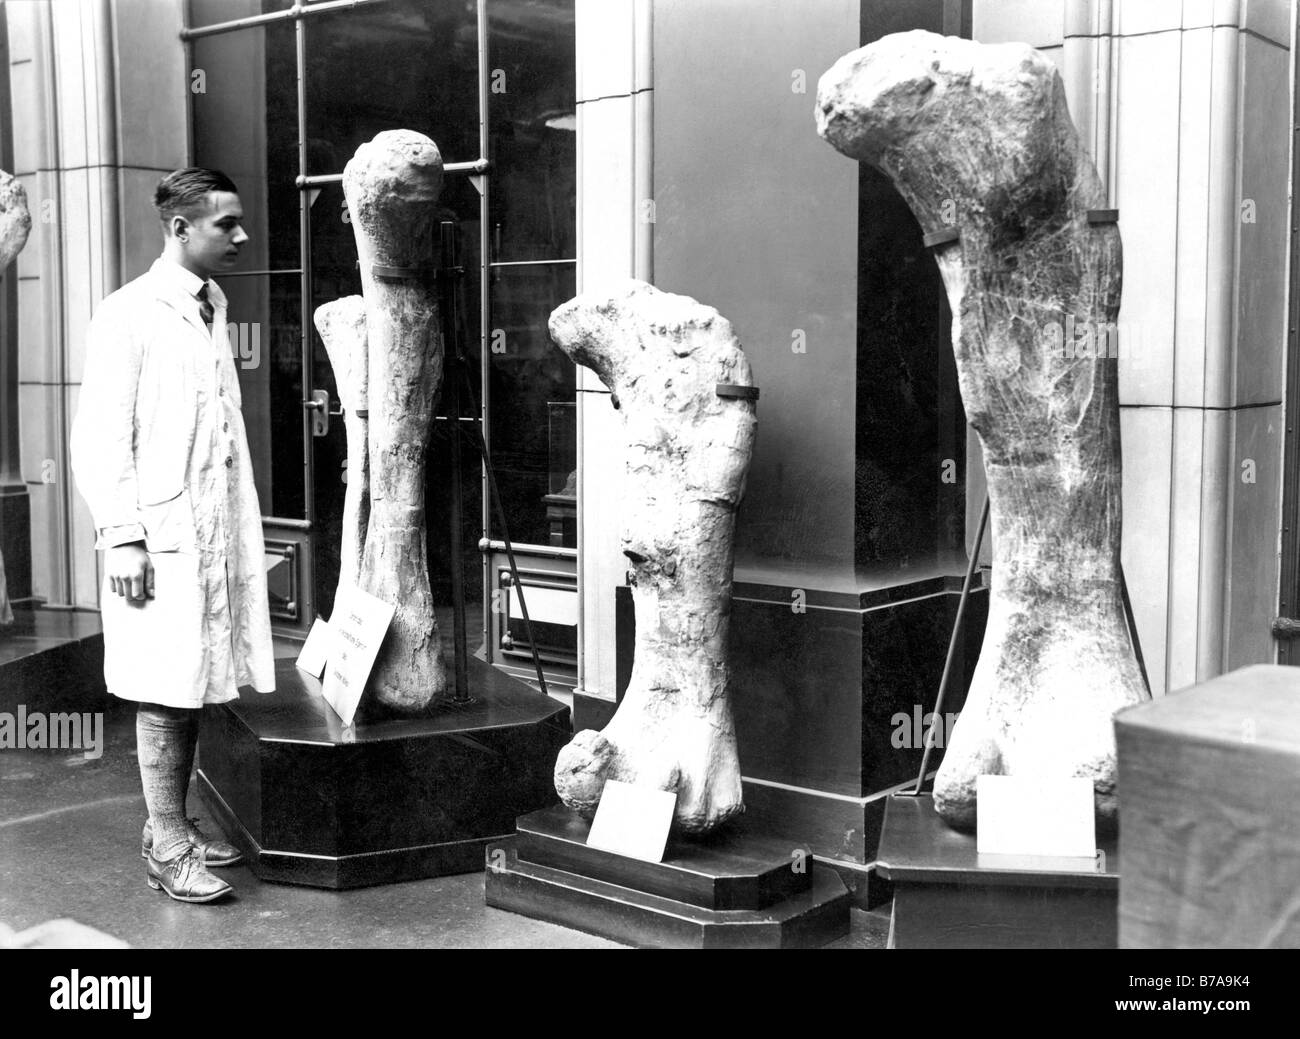 Historic photo, research scientist with dinosaur bones, ca. 1925 - Stock Image